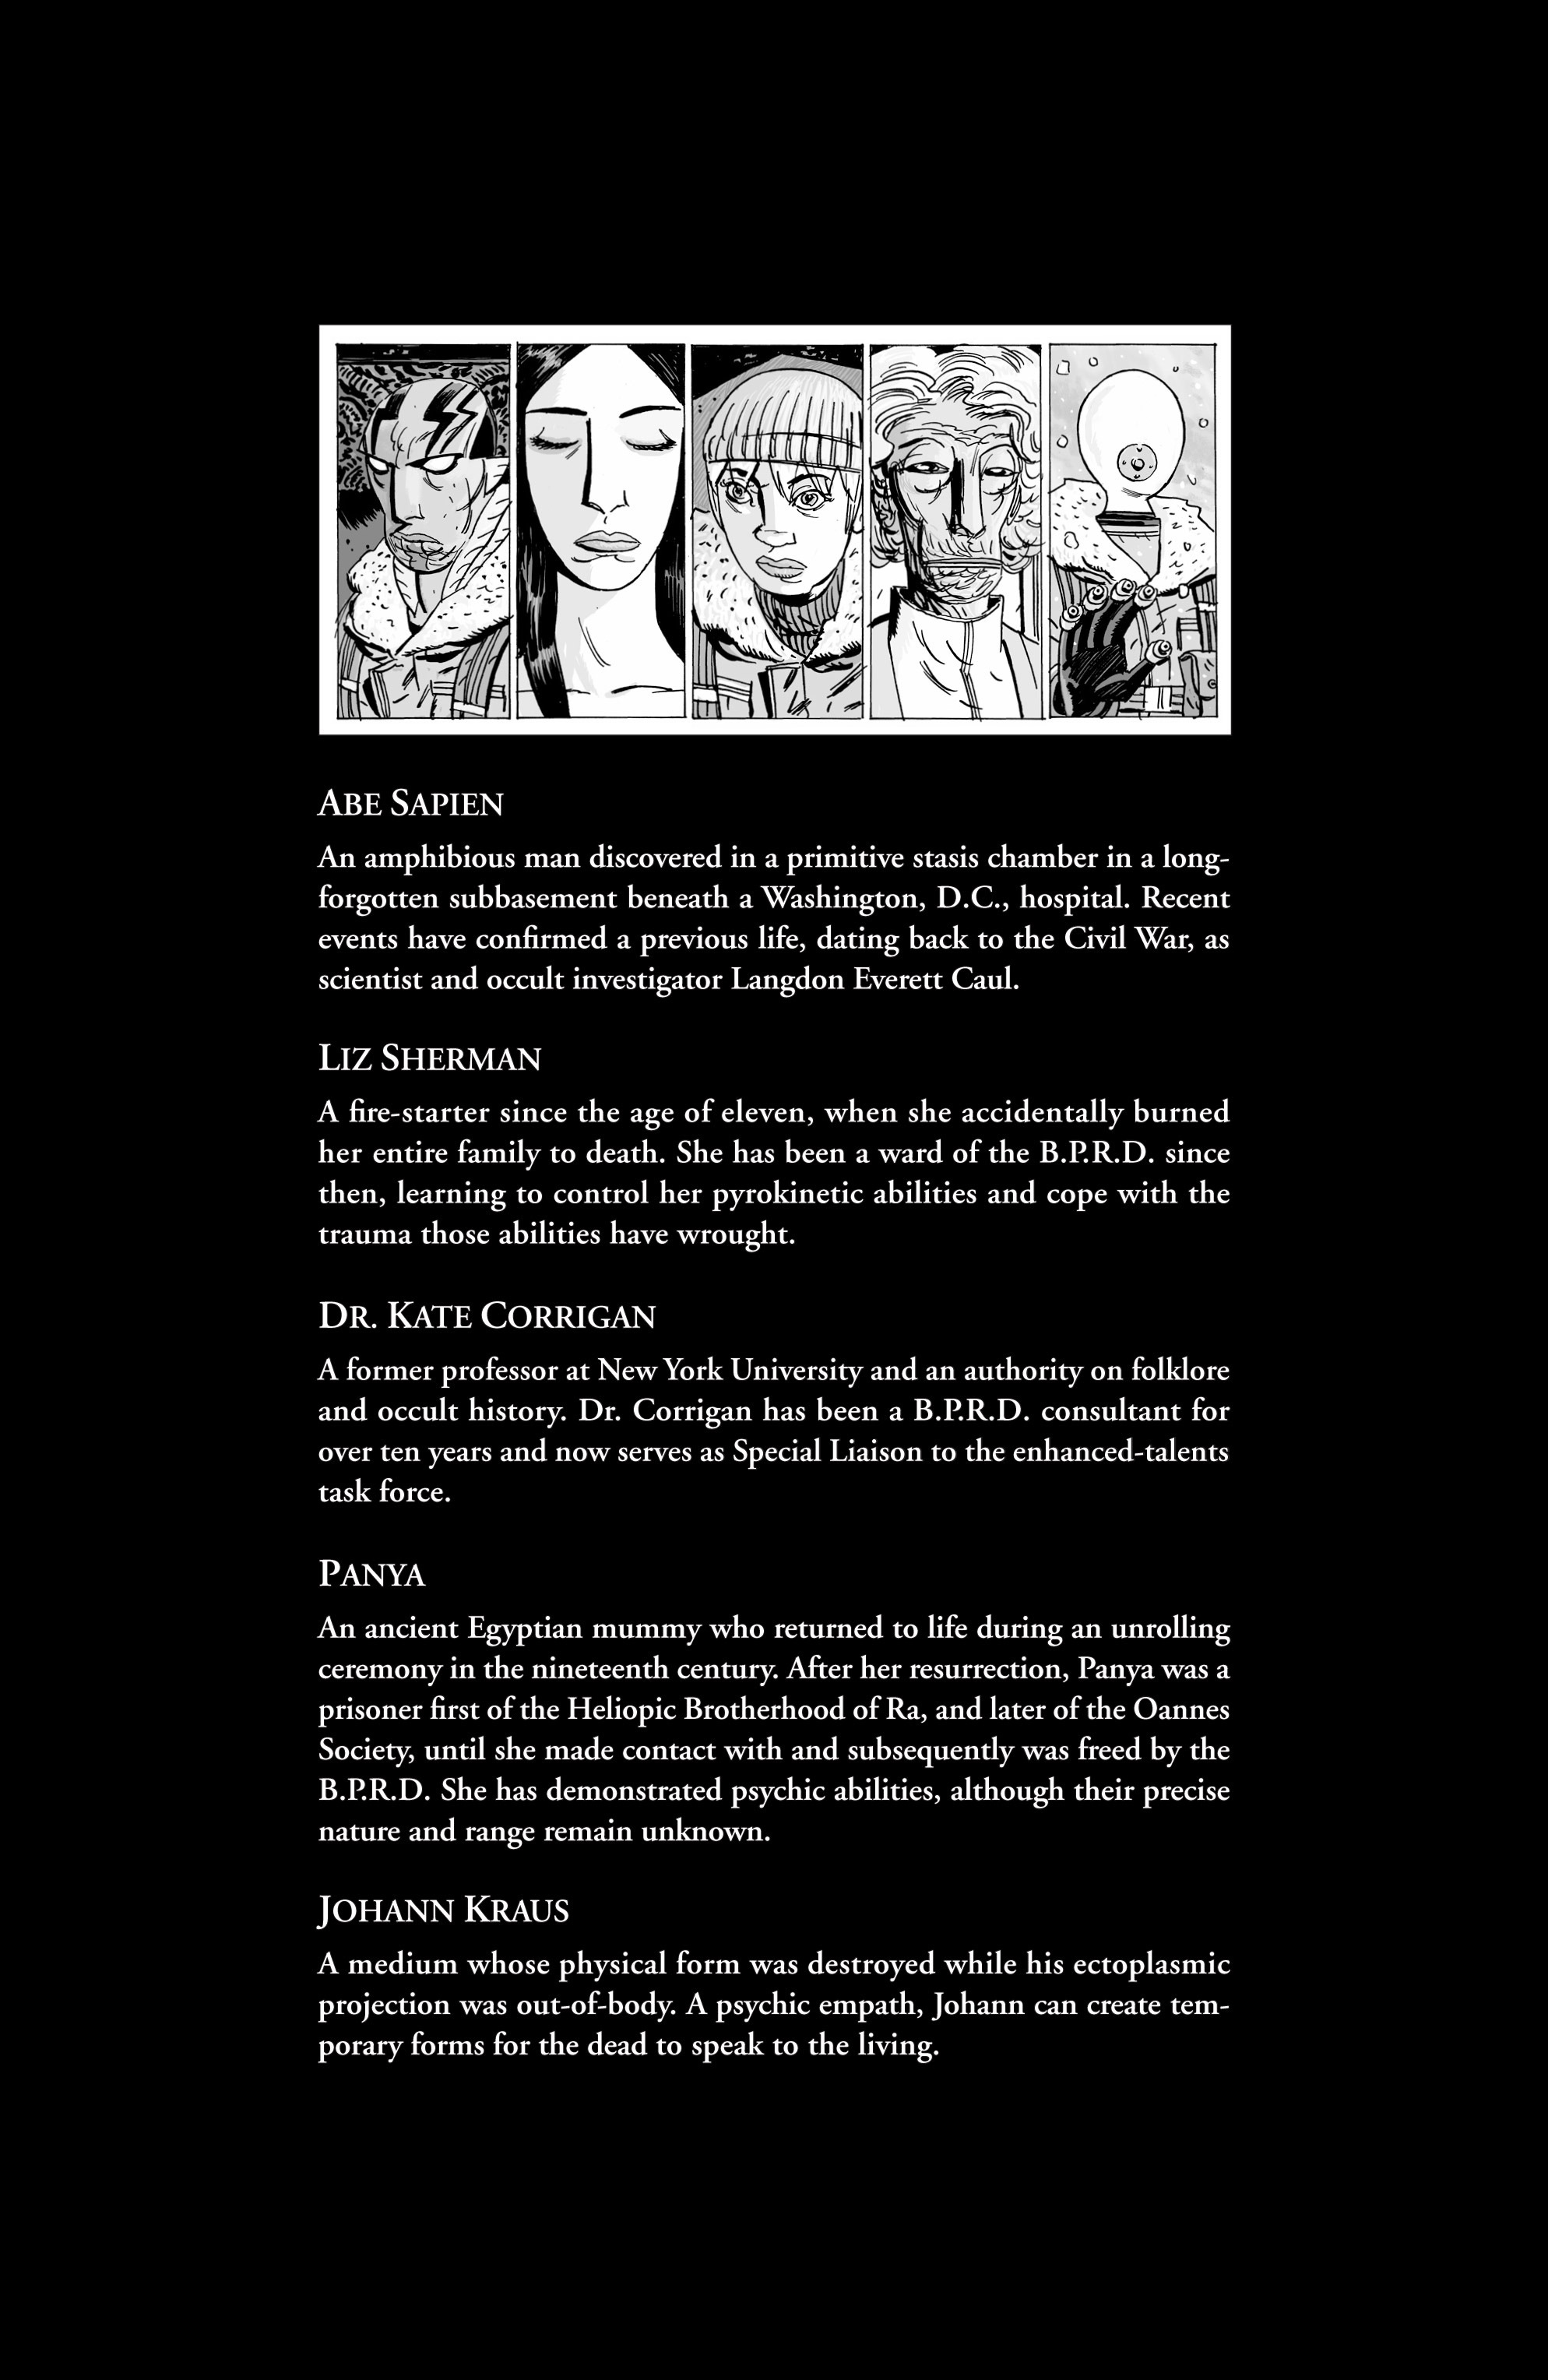 Read online B.P.R.D. (2003) comic -  Issue # TPB 11 - 4